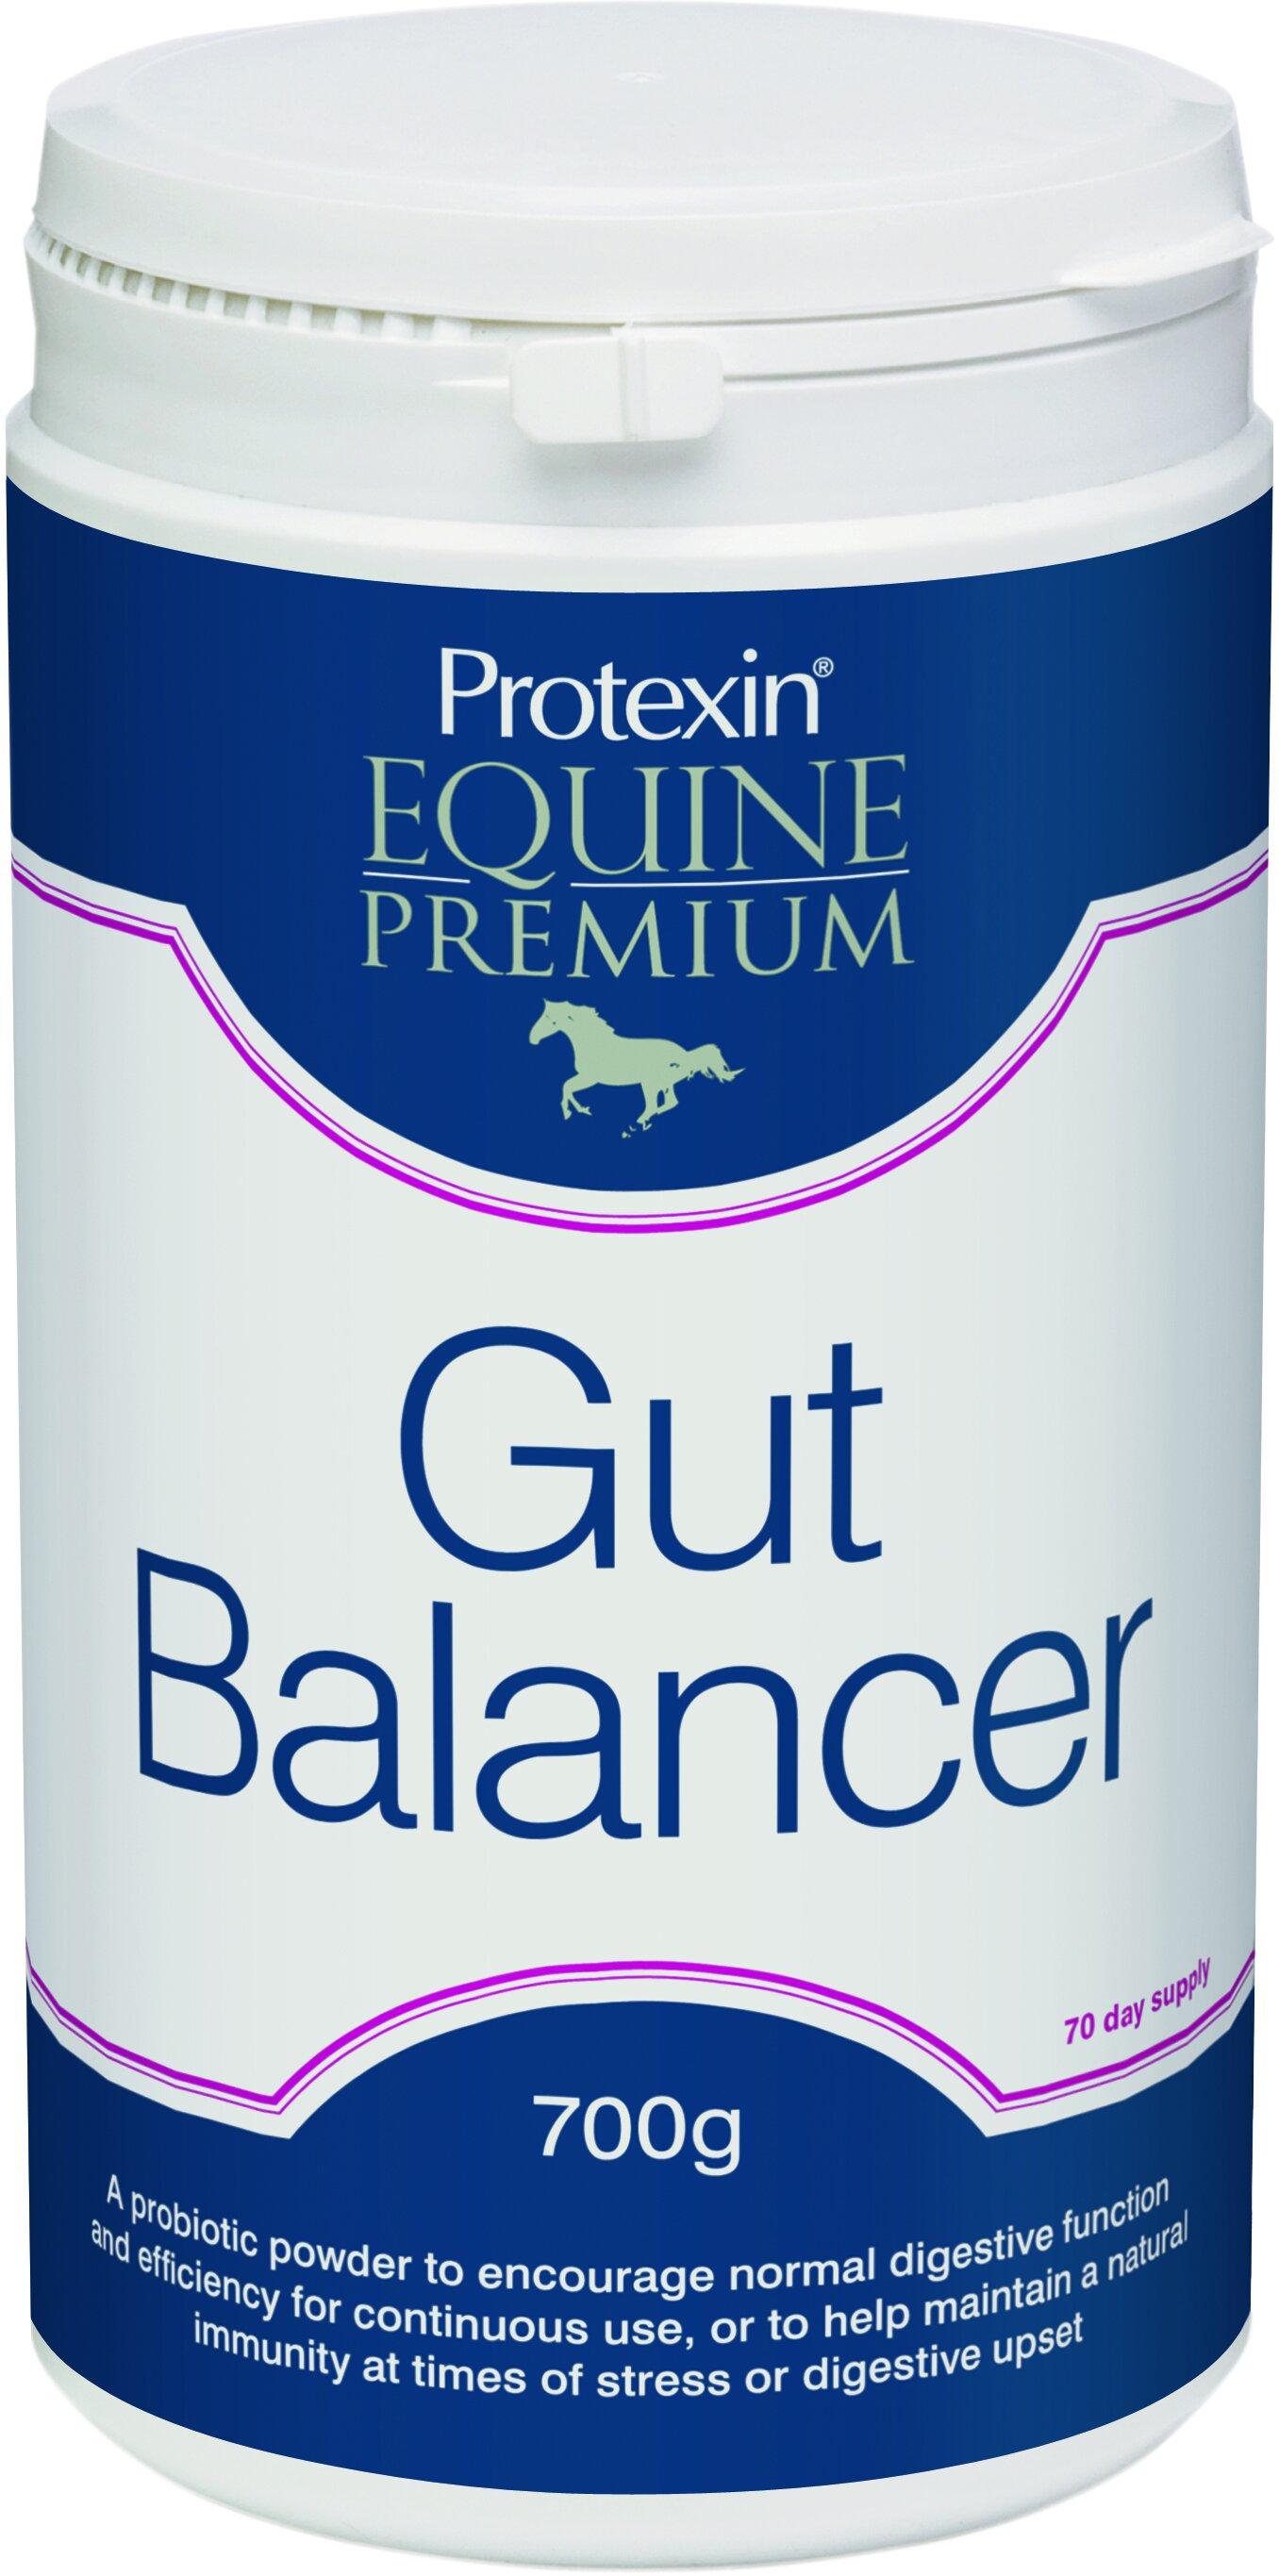 Gut Balancer Protexin